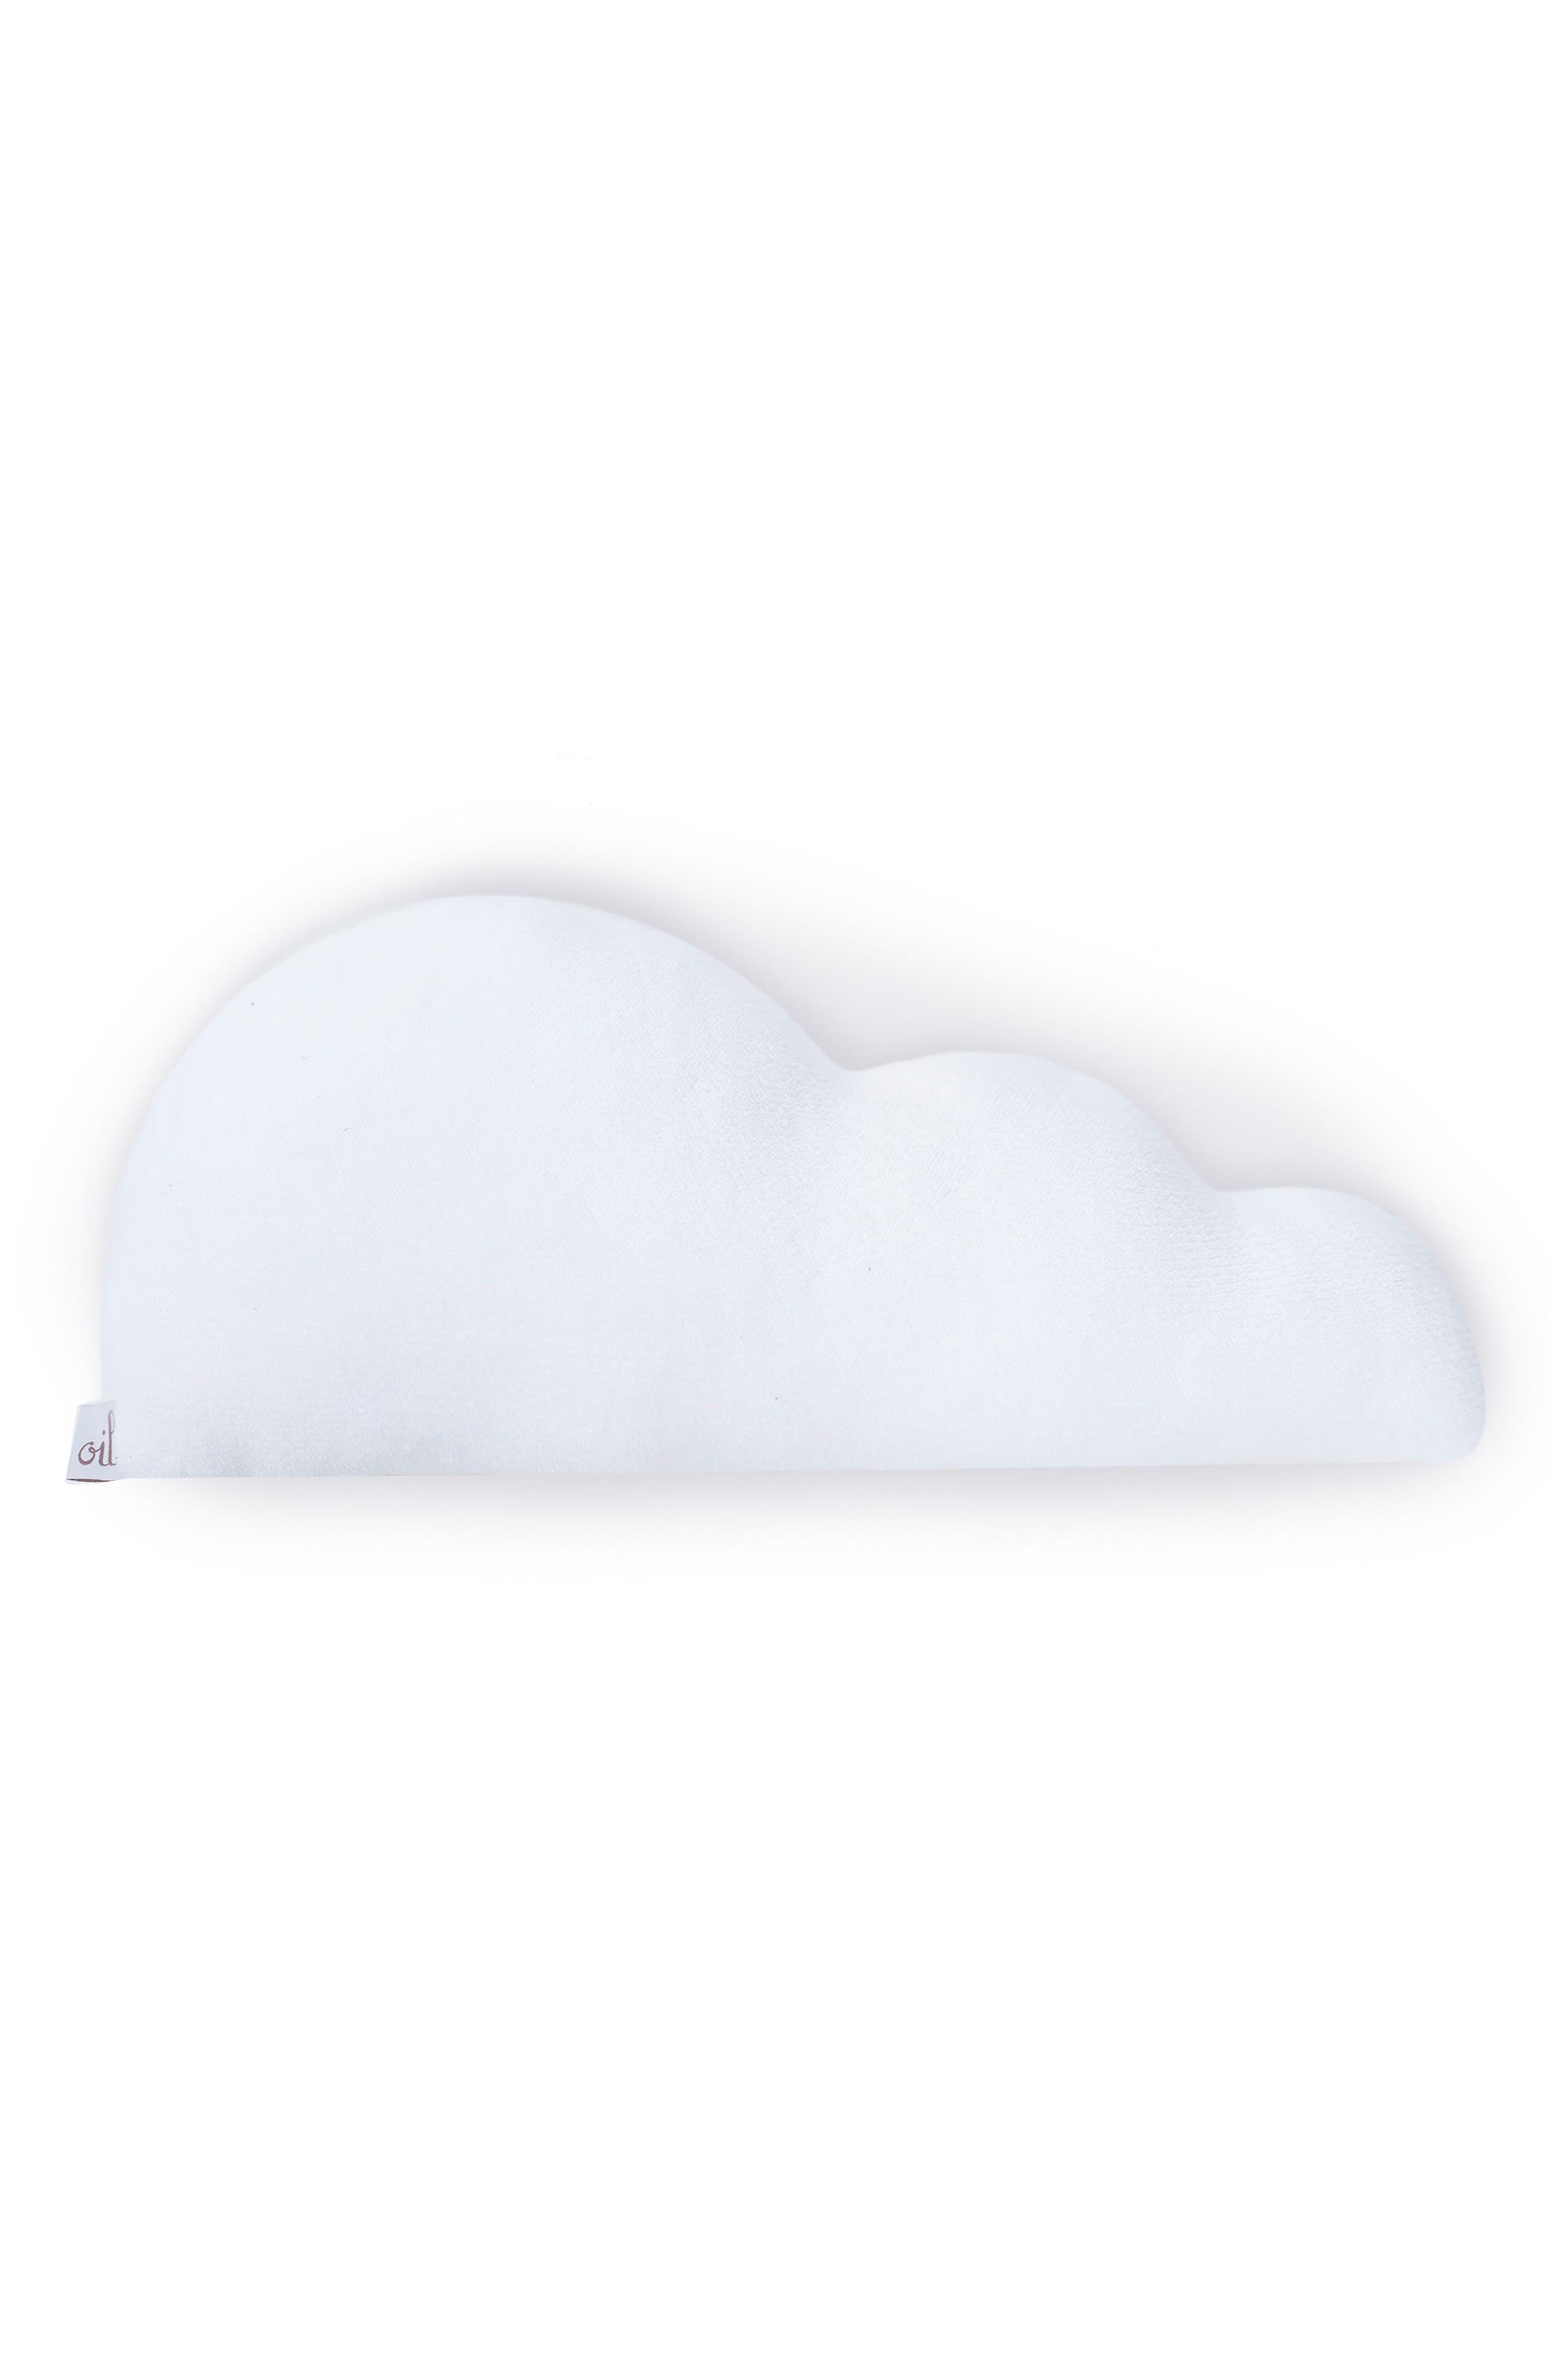 Indigo Moon & White Cloud Pillow Set,                             Alternate thumbnail 2, color,                             ELEFANT